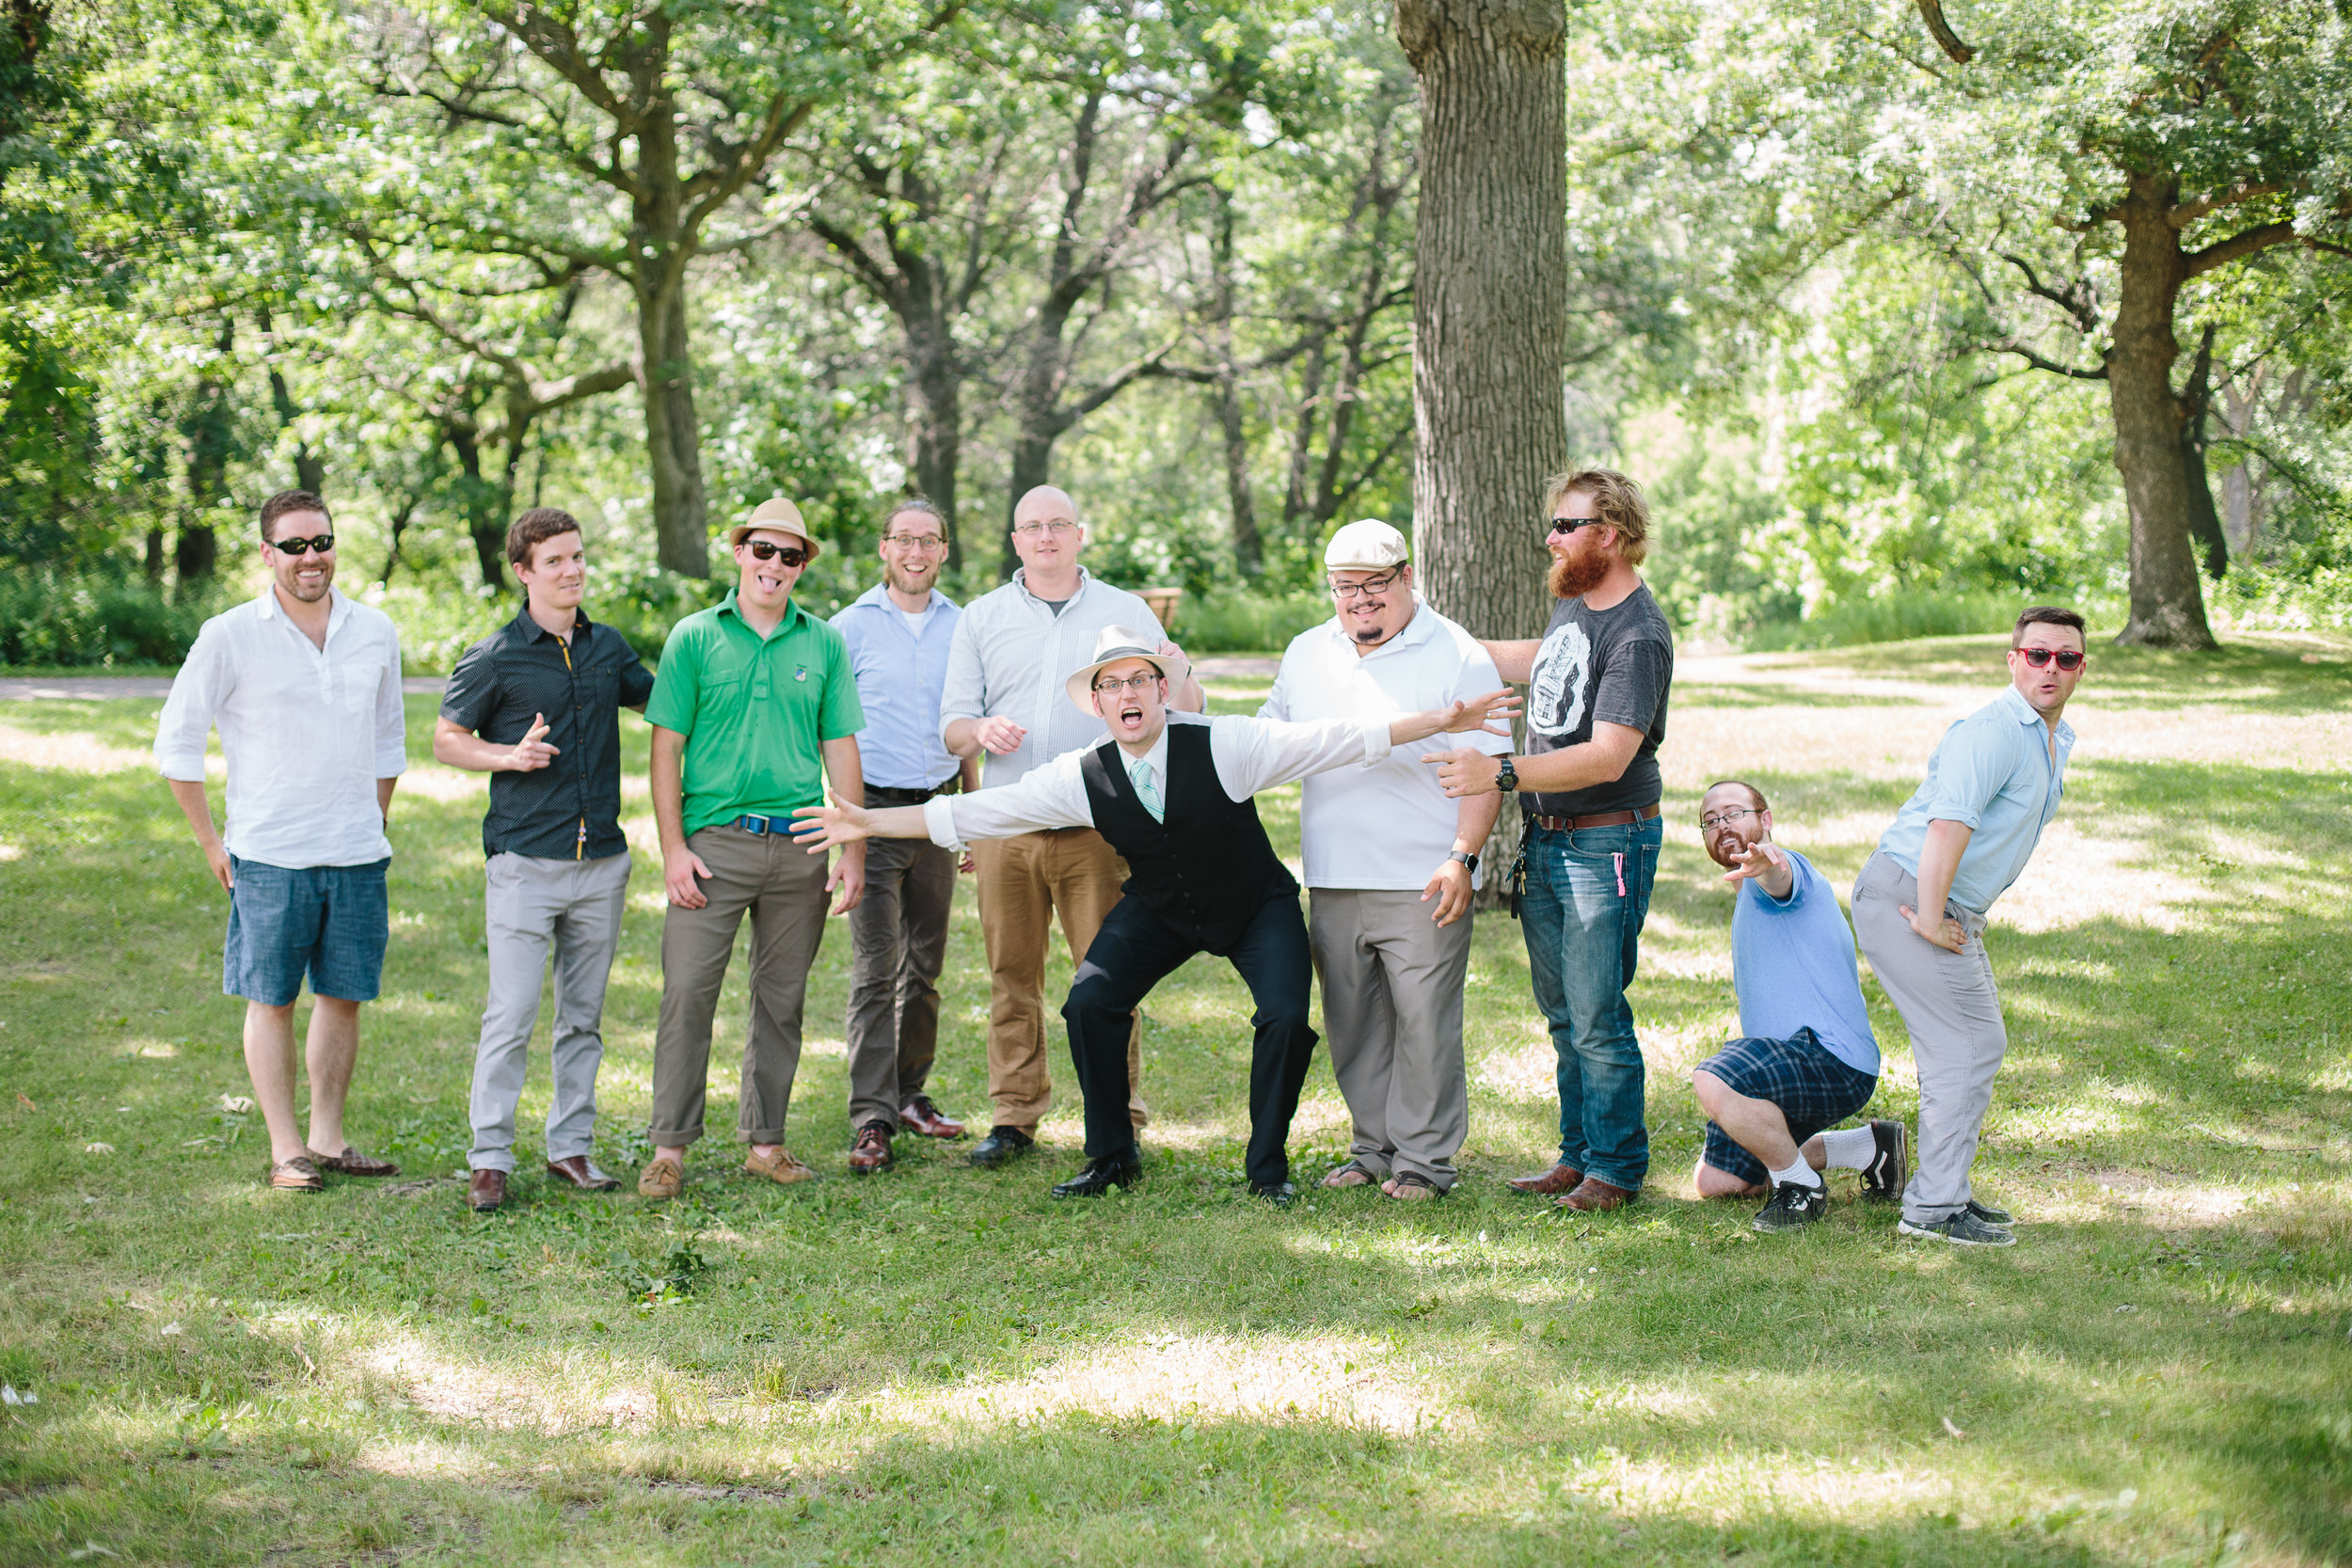 FAVORITES-2017.07.15 Stoltz_Burkhart Wedding 2599-91.jpg